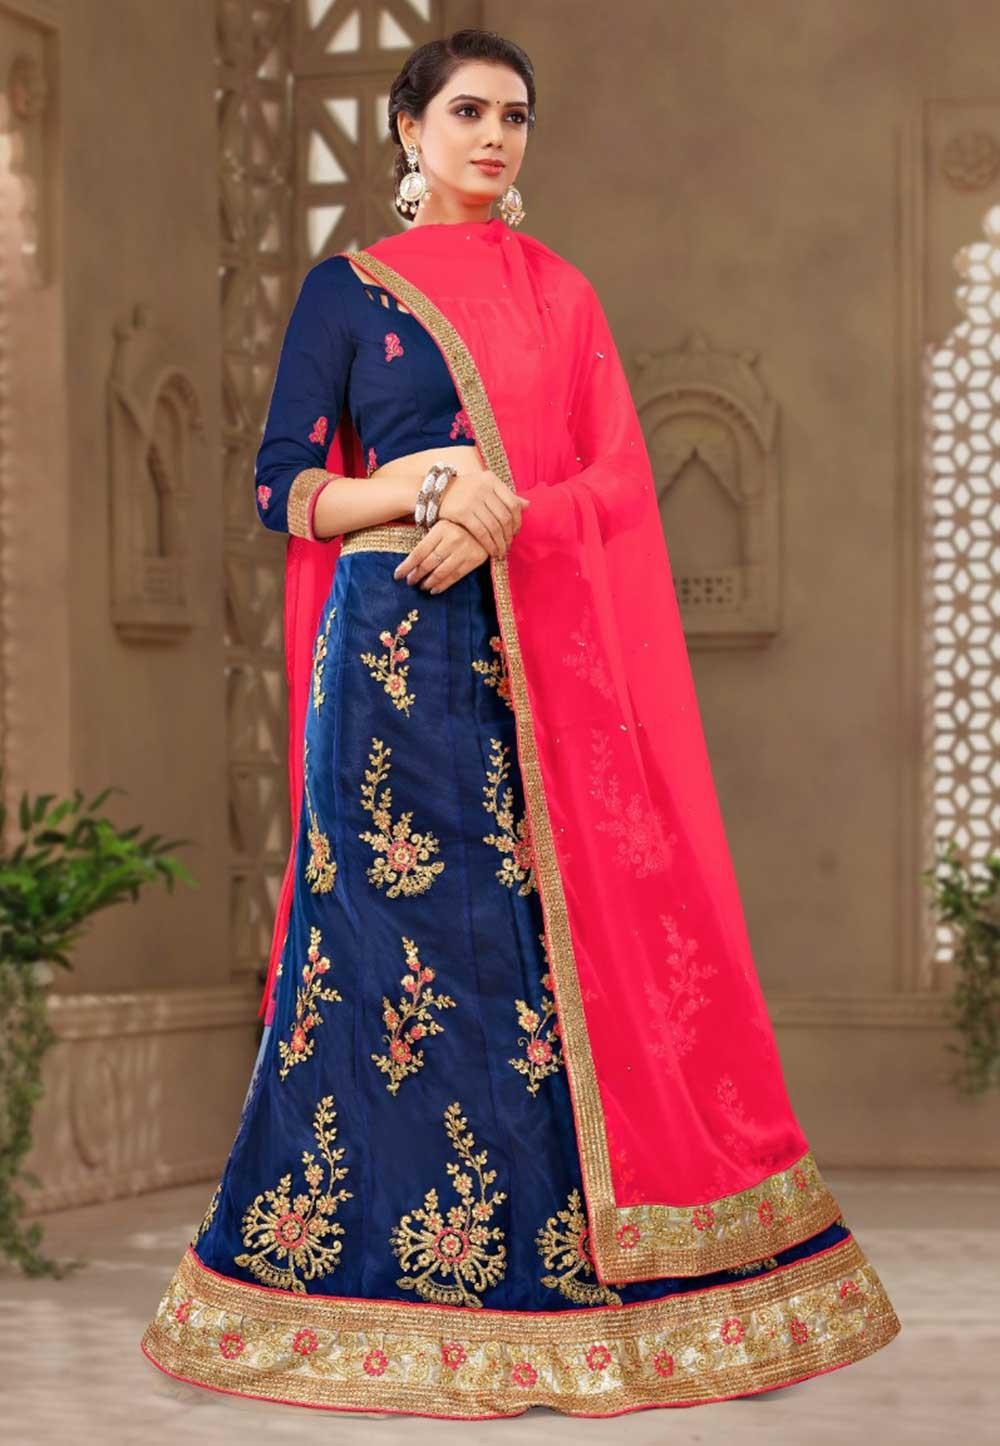 Blue Colour Party Wear Lehenga choli for bridesmaid